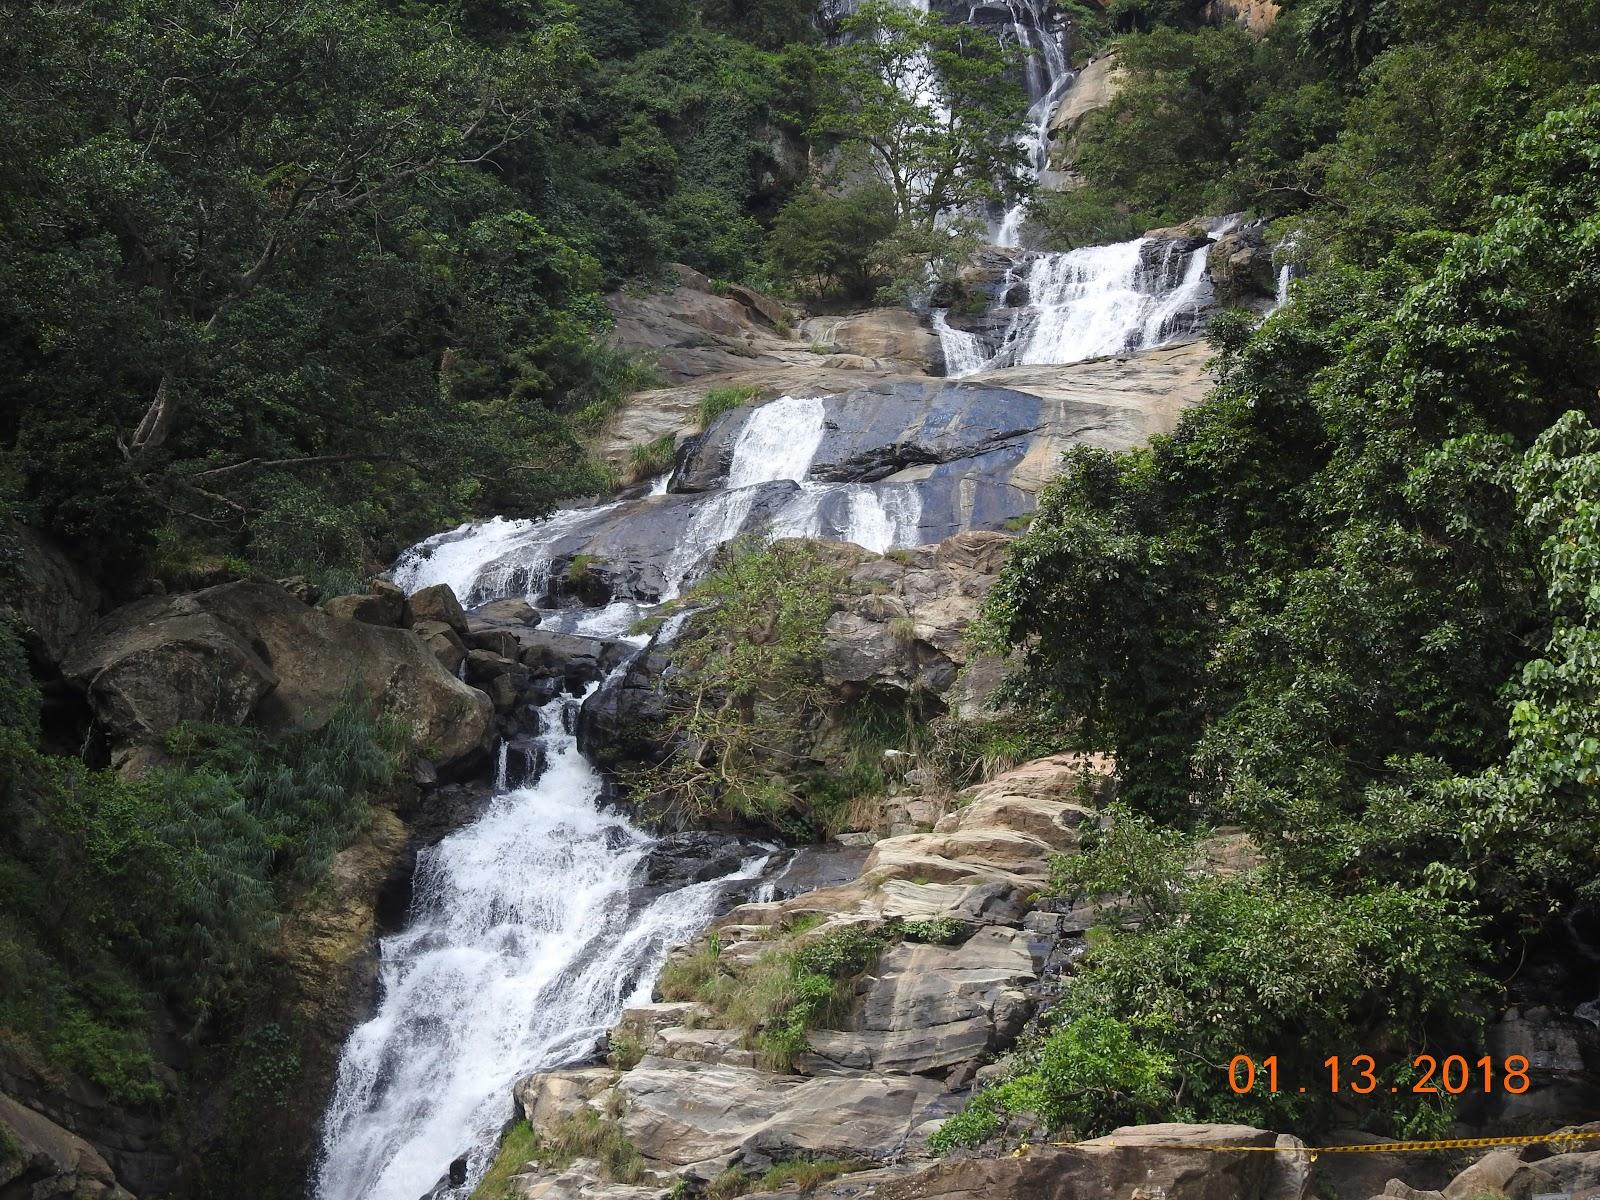 invite-to-paradise-sri-lanka-maldives-holiday-specialists-nutan-vidyut-patel-waterfall.jpg